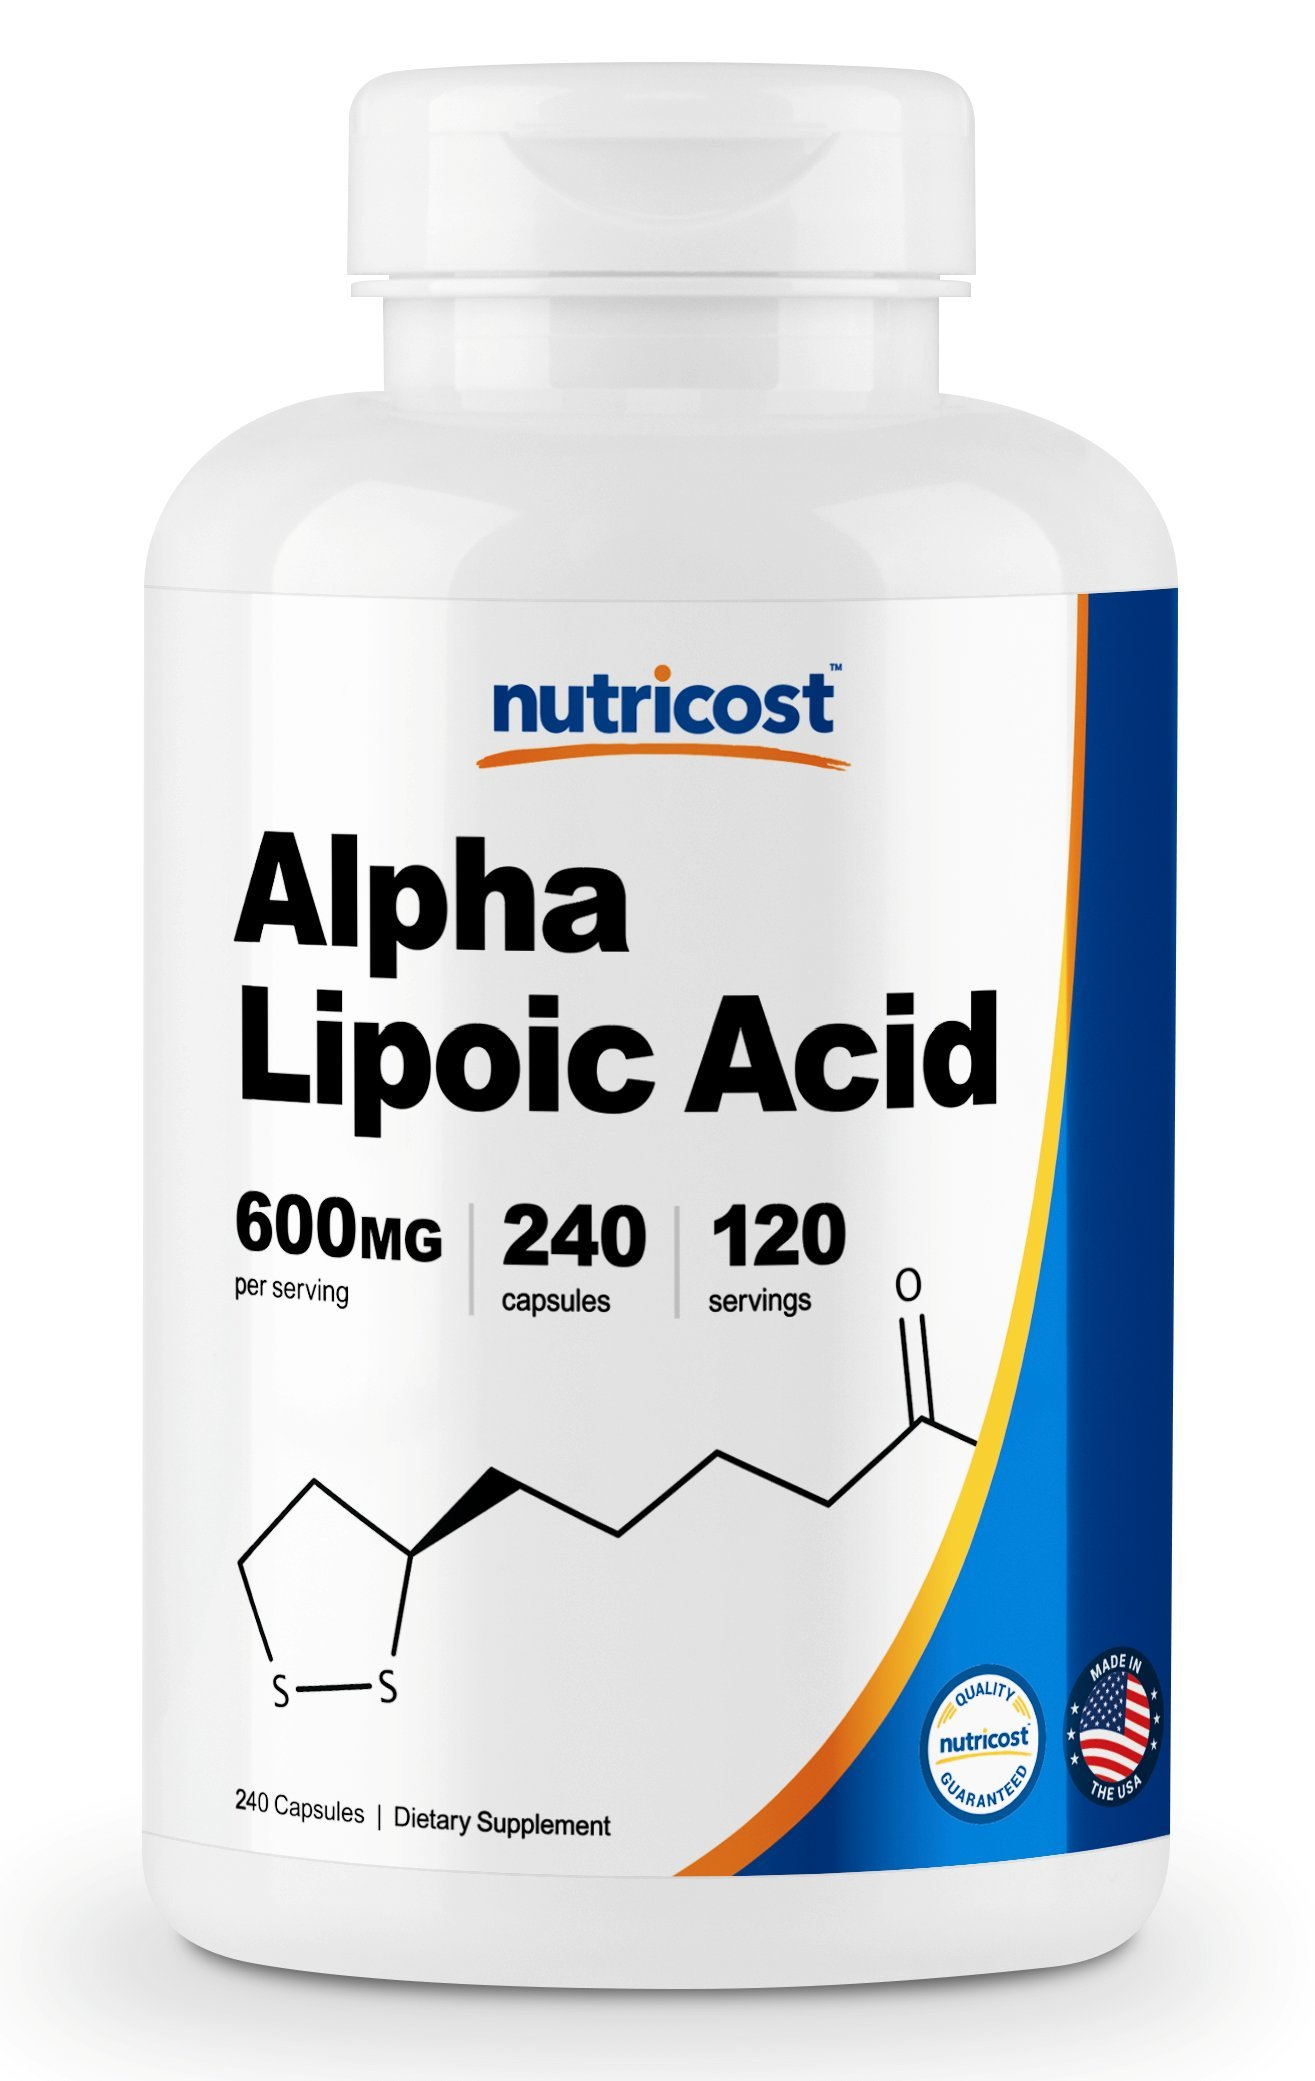 Nutricost Alpha Lipoic Acid - 600mg Per Serving - 240 Capsules